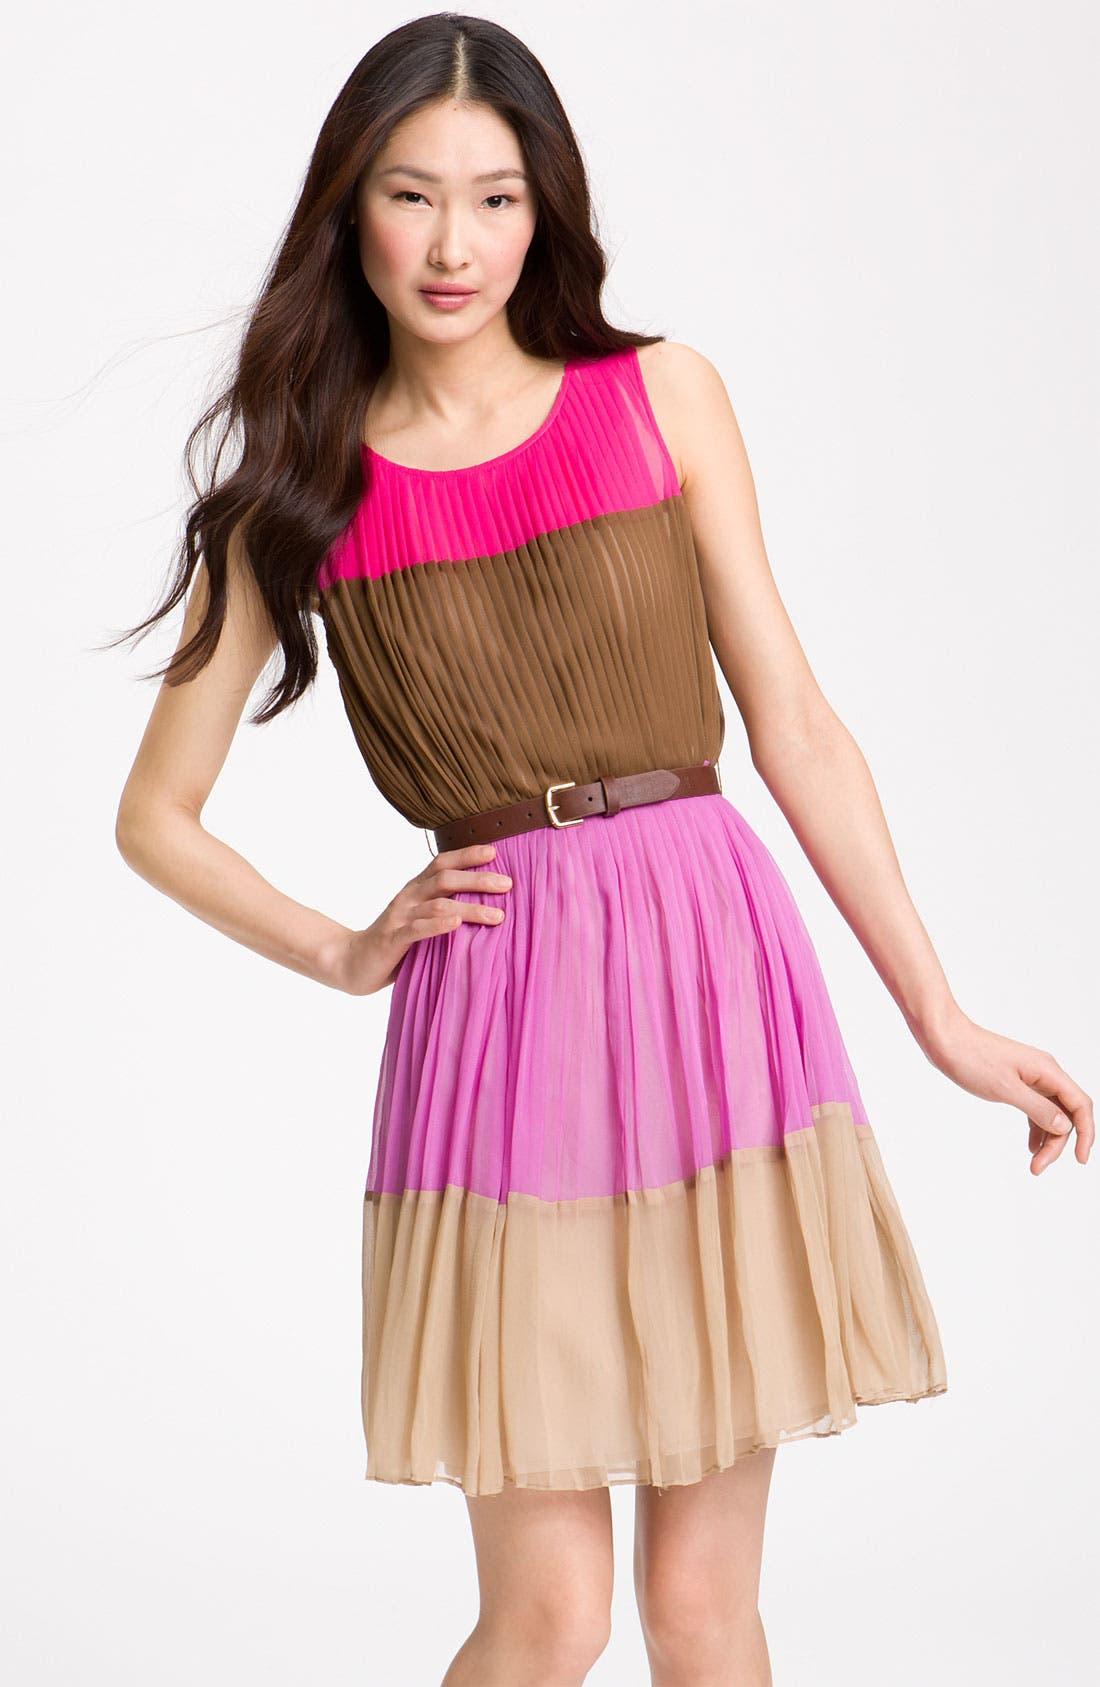 Alternate Image 1 Selected - Julie Dillon Colorblock Chiffon Dress